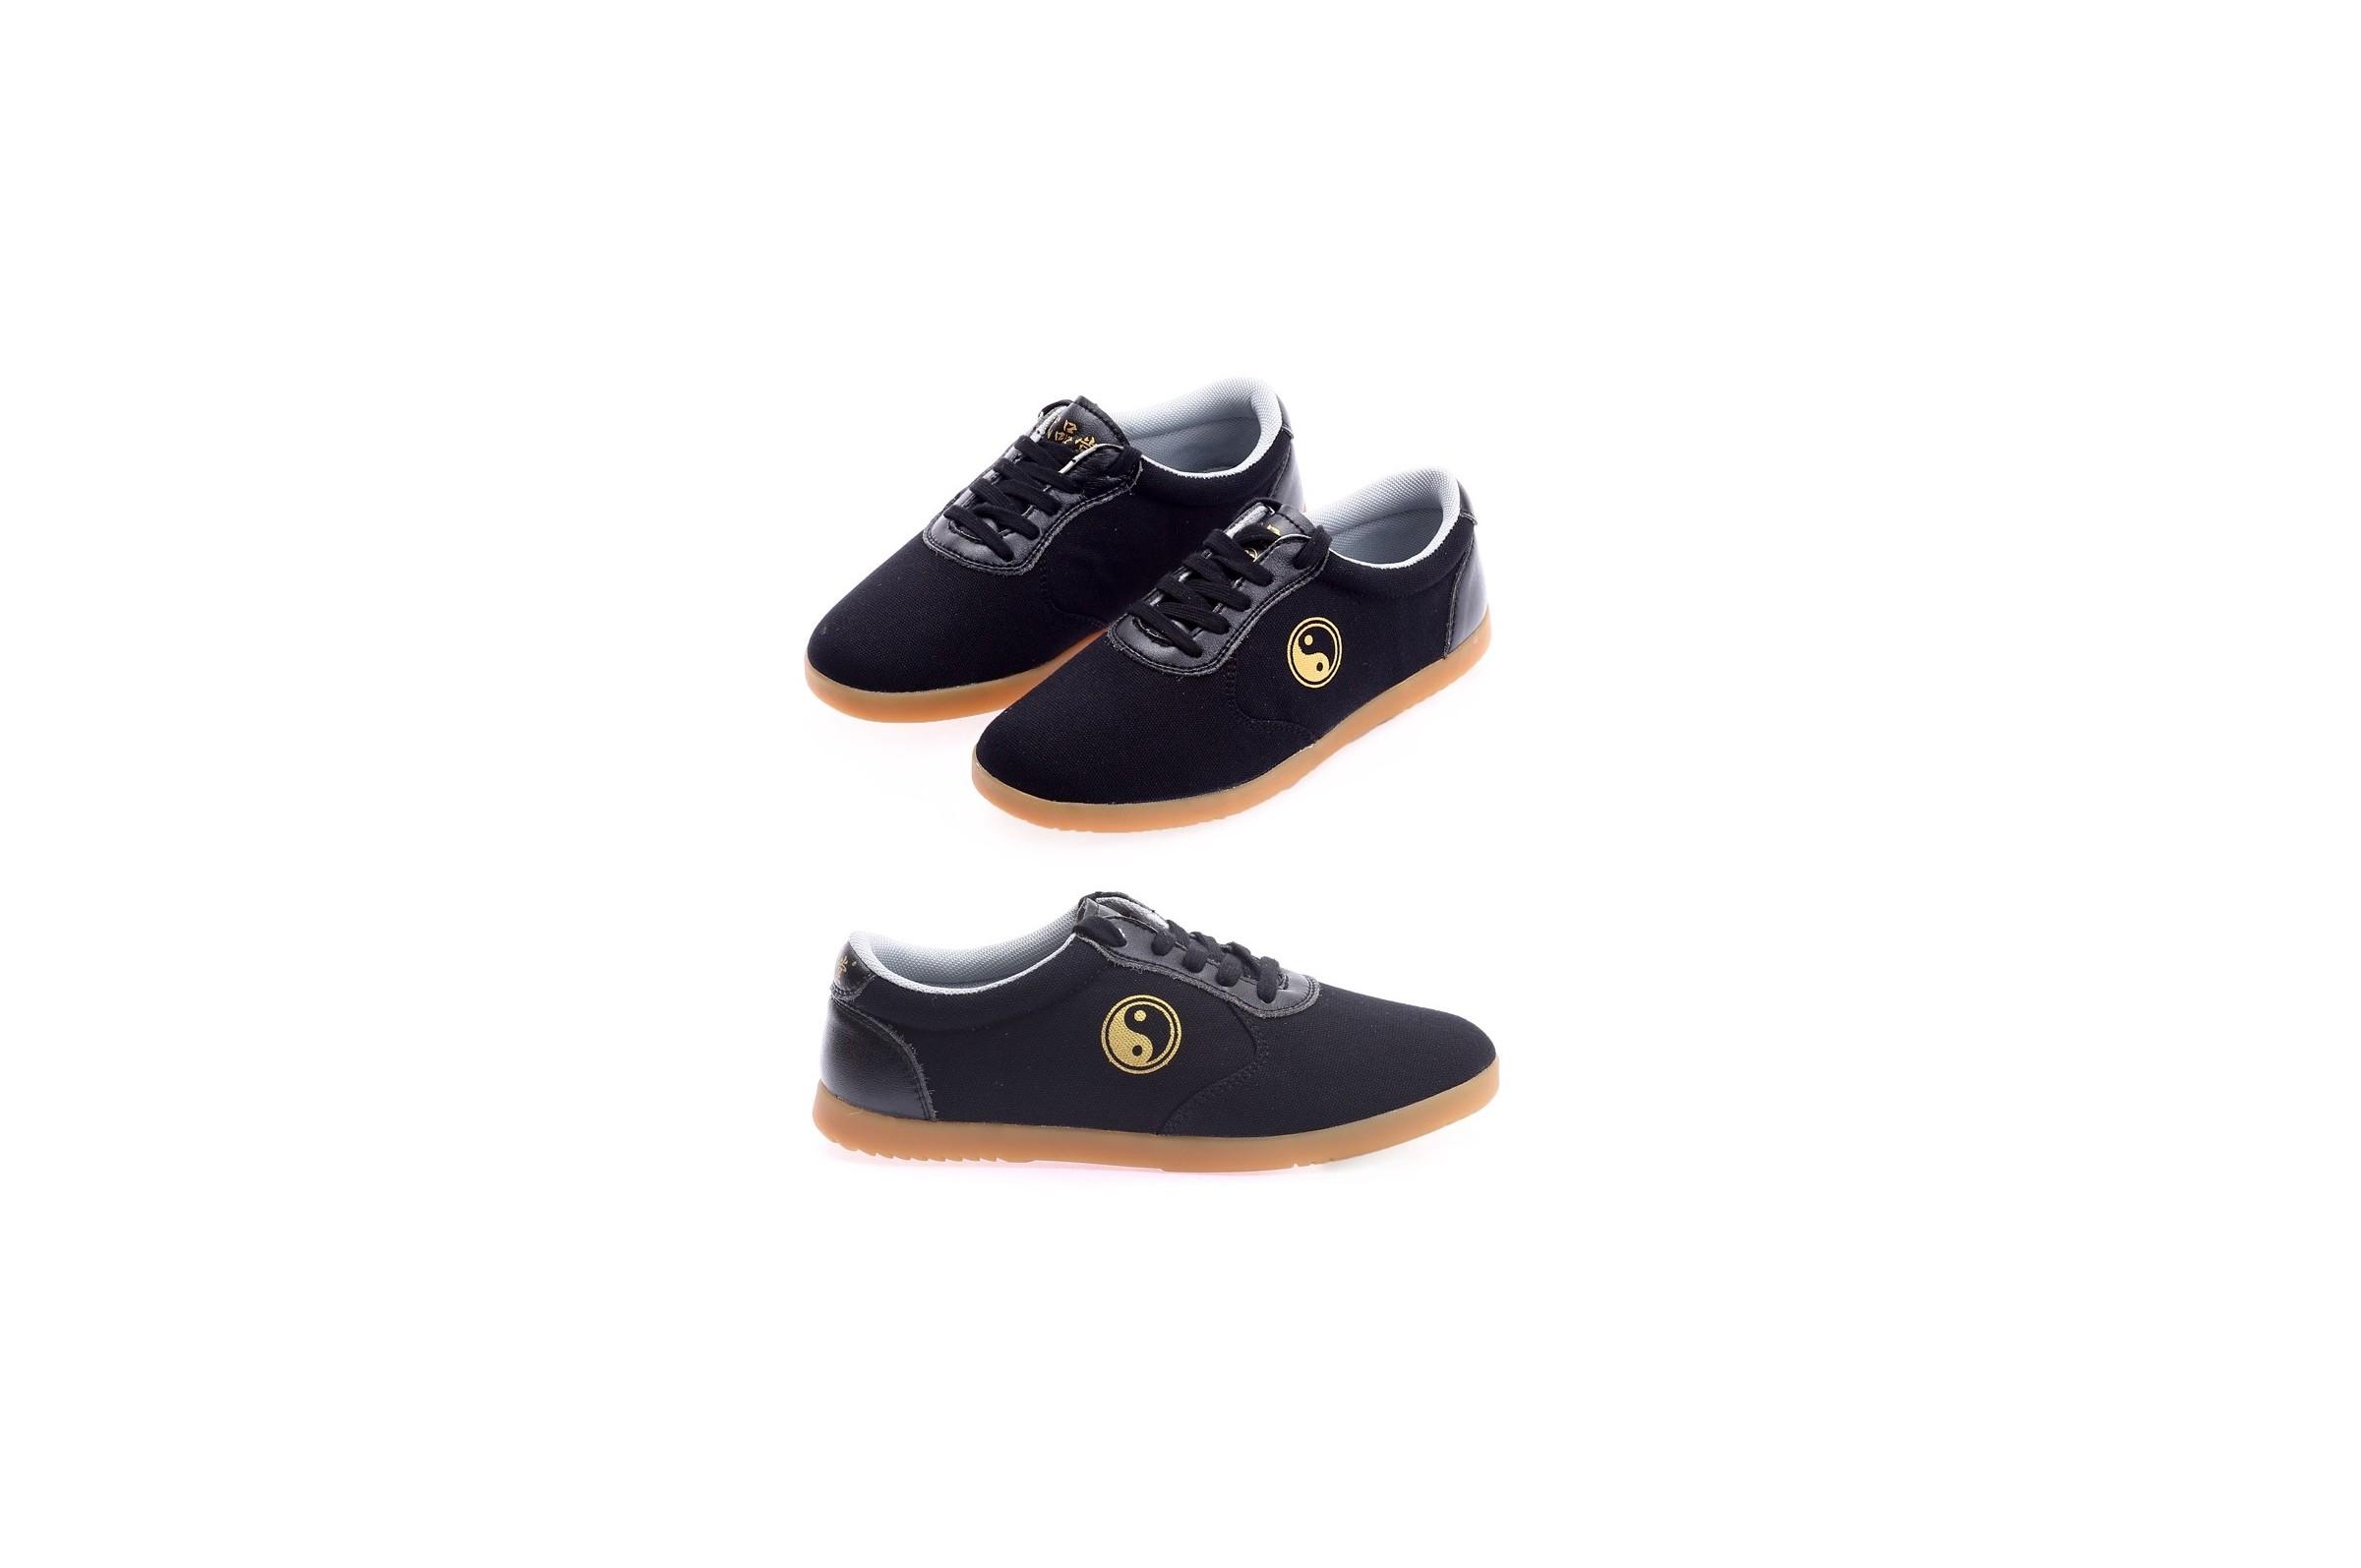 [Déstock] Chaussures Toile WPT, 45